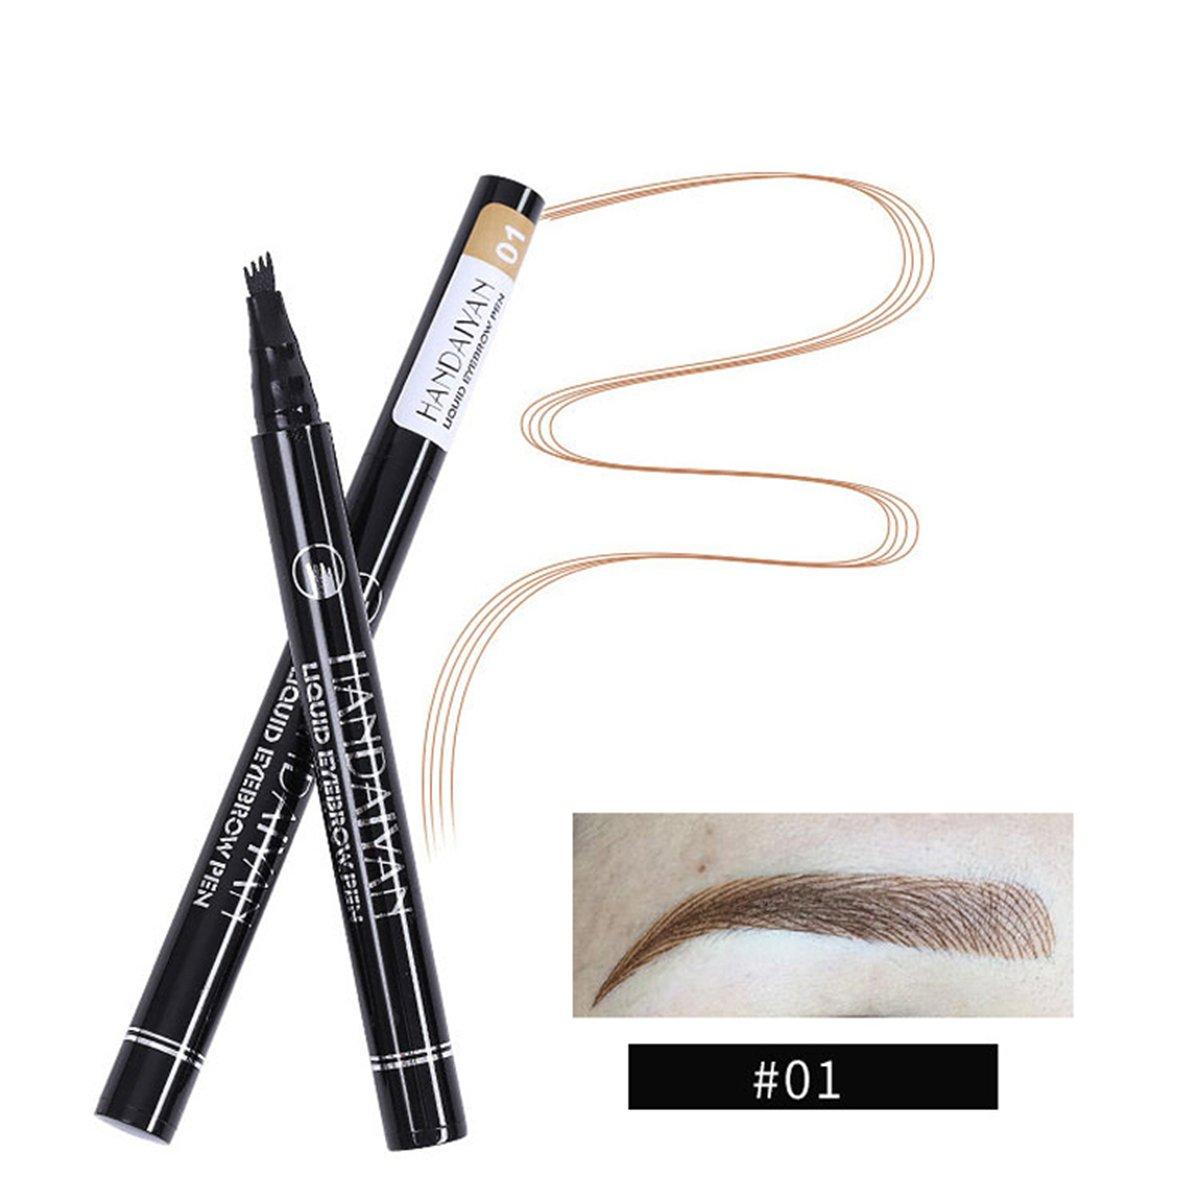 AIKIMUSE Eyebrow Tattoo Penwith 4 Tips, Liquid Long Lasting Brow Pencil Waterproof Smudge-prooffor Eye Makeup (03)